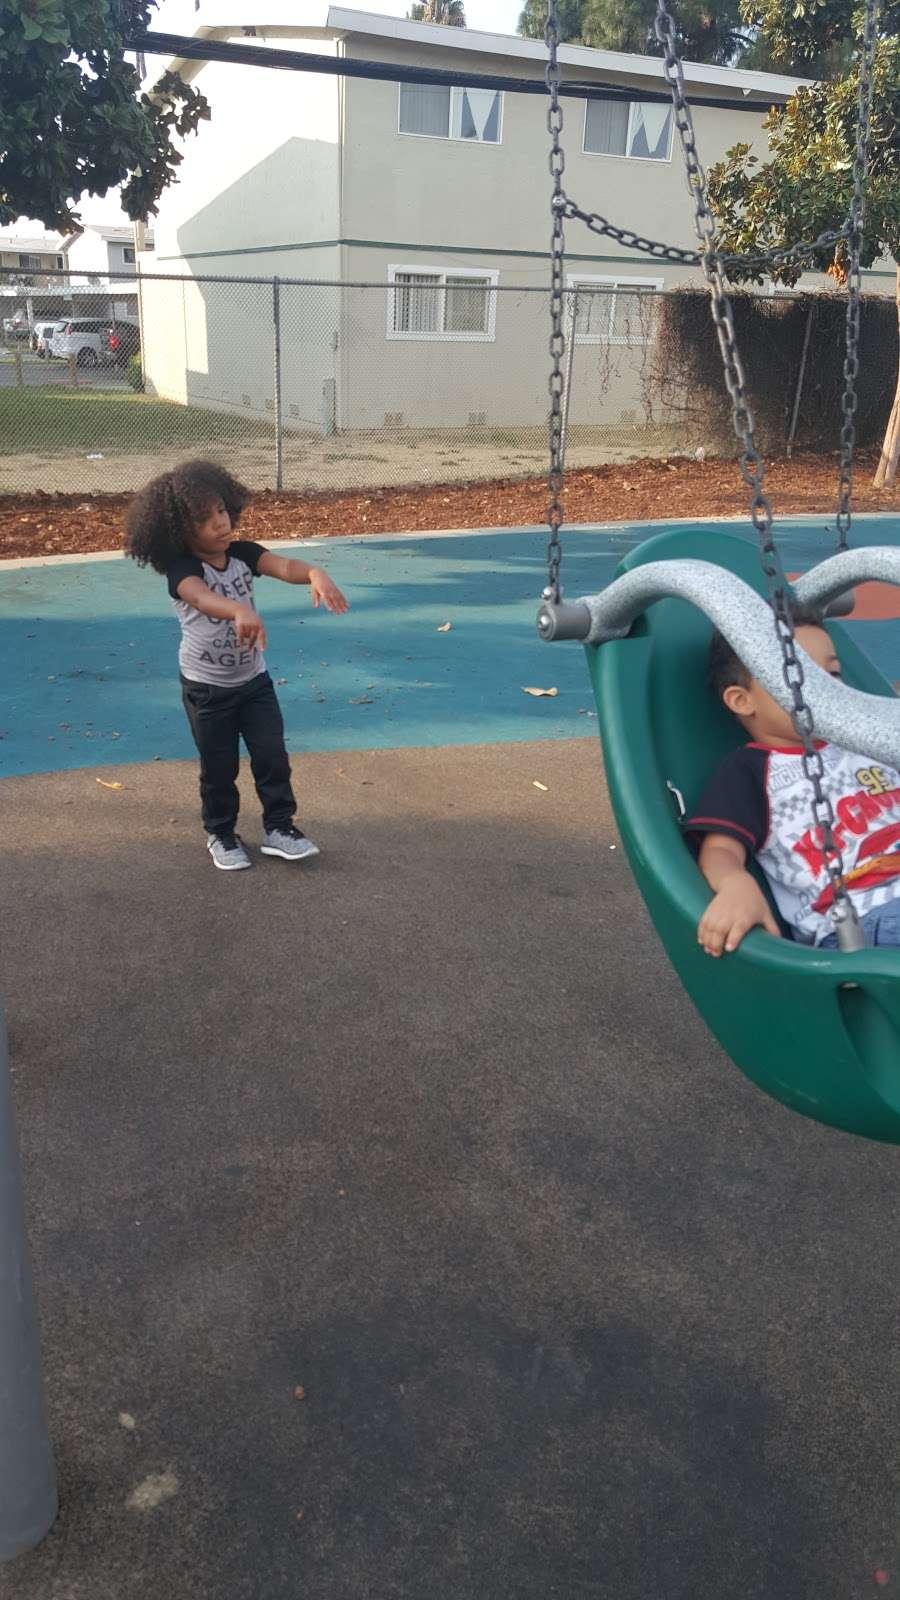 McLaughlin Park - park  | Photo 8 of 10 | Address: 1092 Owsley Ave, San Jose, CA 95122, USA | Phone: (408) 535-3500